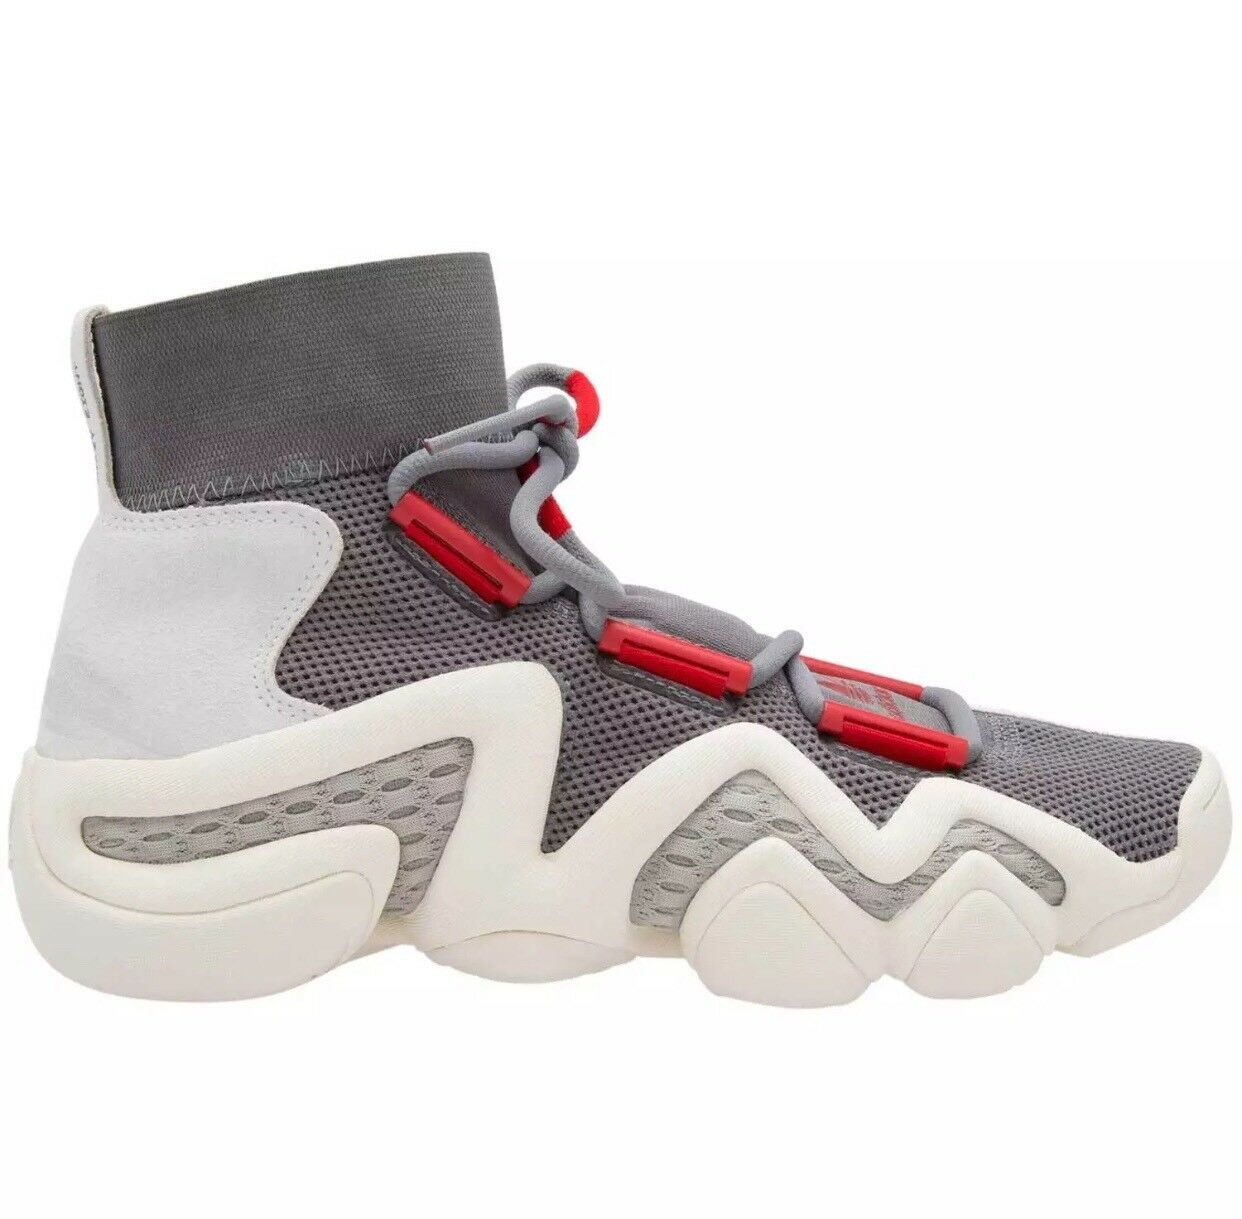 Adidas Crazy 8 Adv Consortium CQ1869 A  D PARALLEL DIMENSION Workshop GREY RED